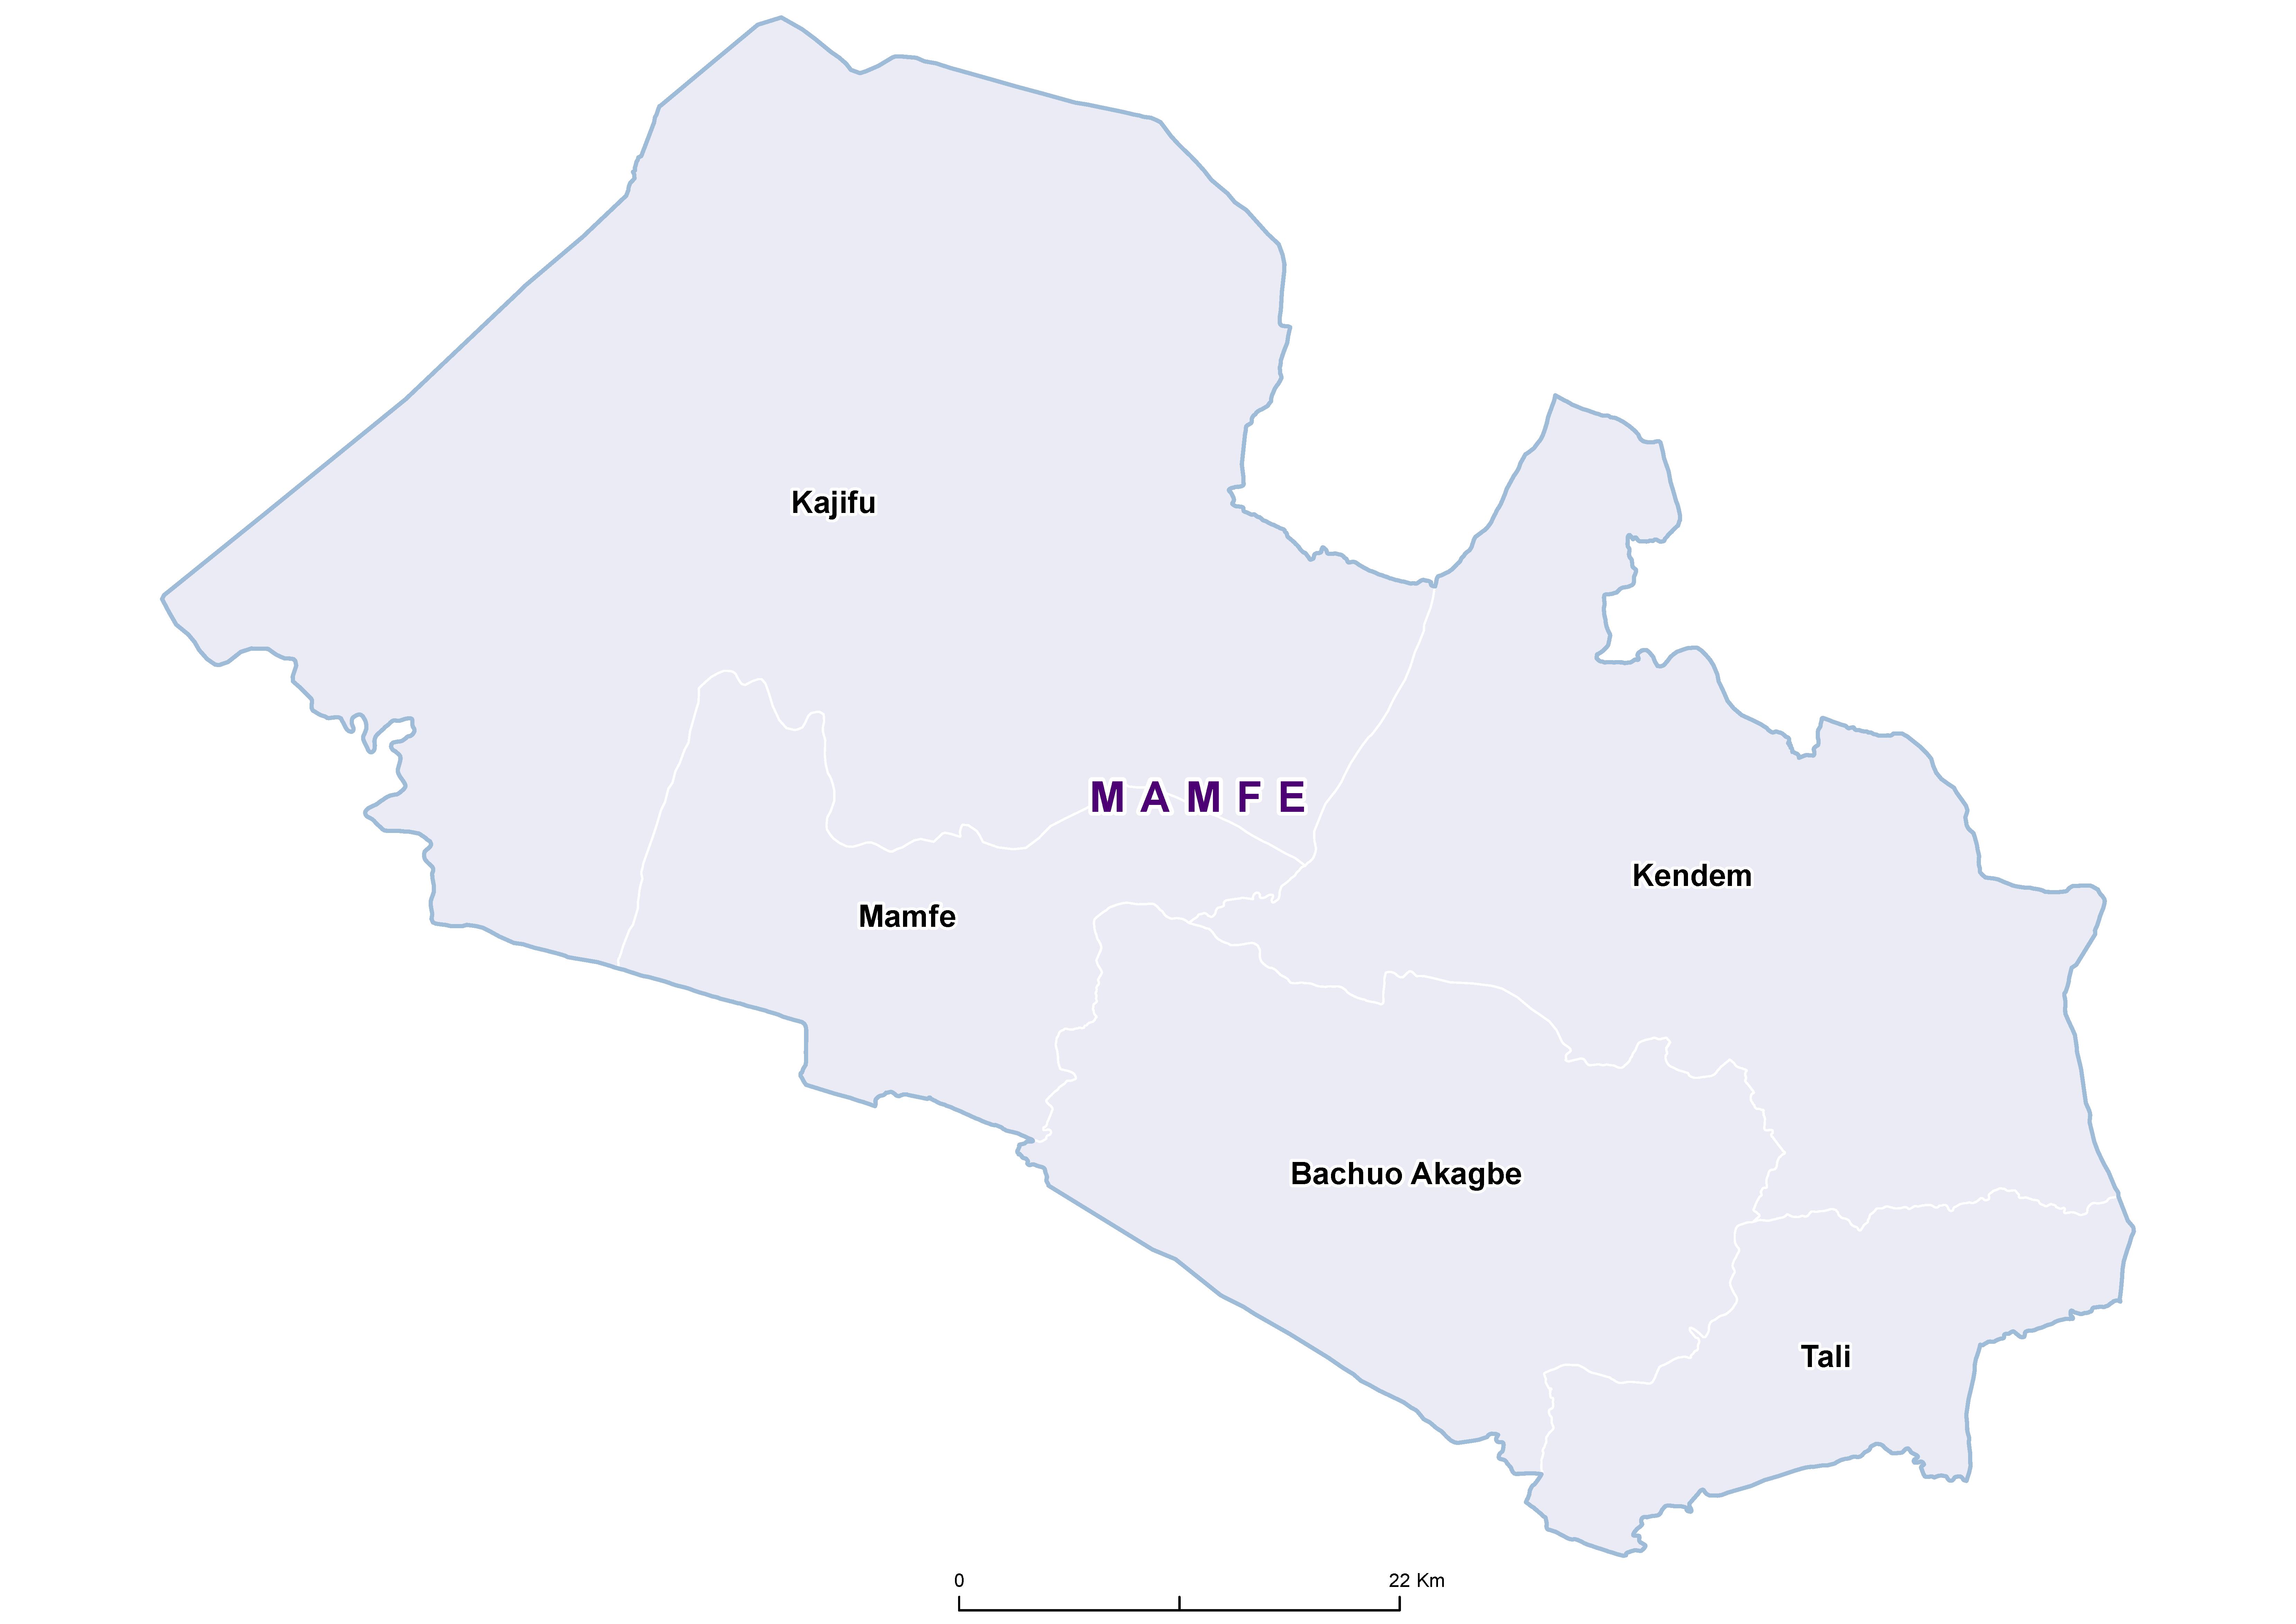 Mamfe SCH 20180001